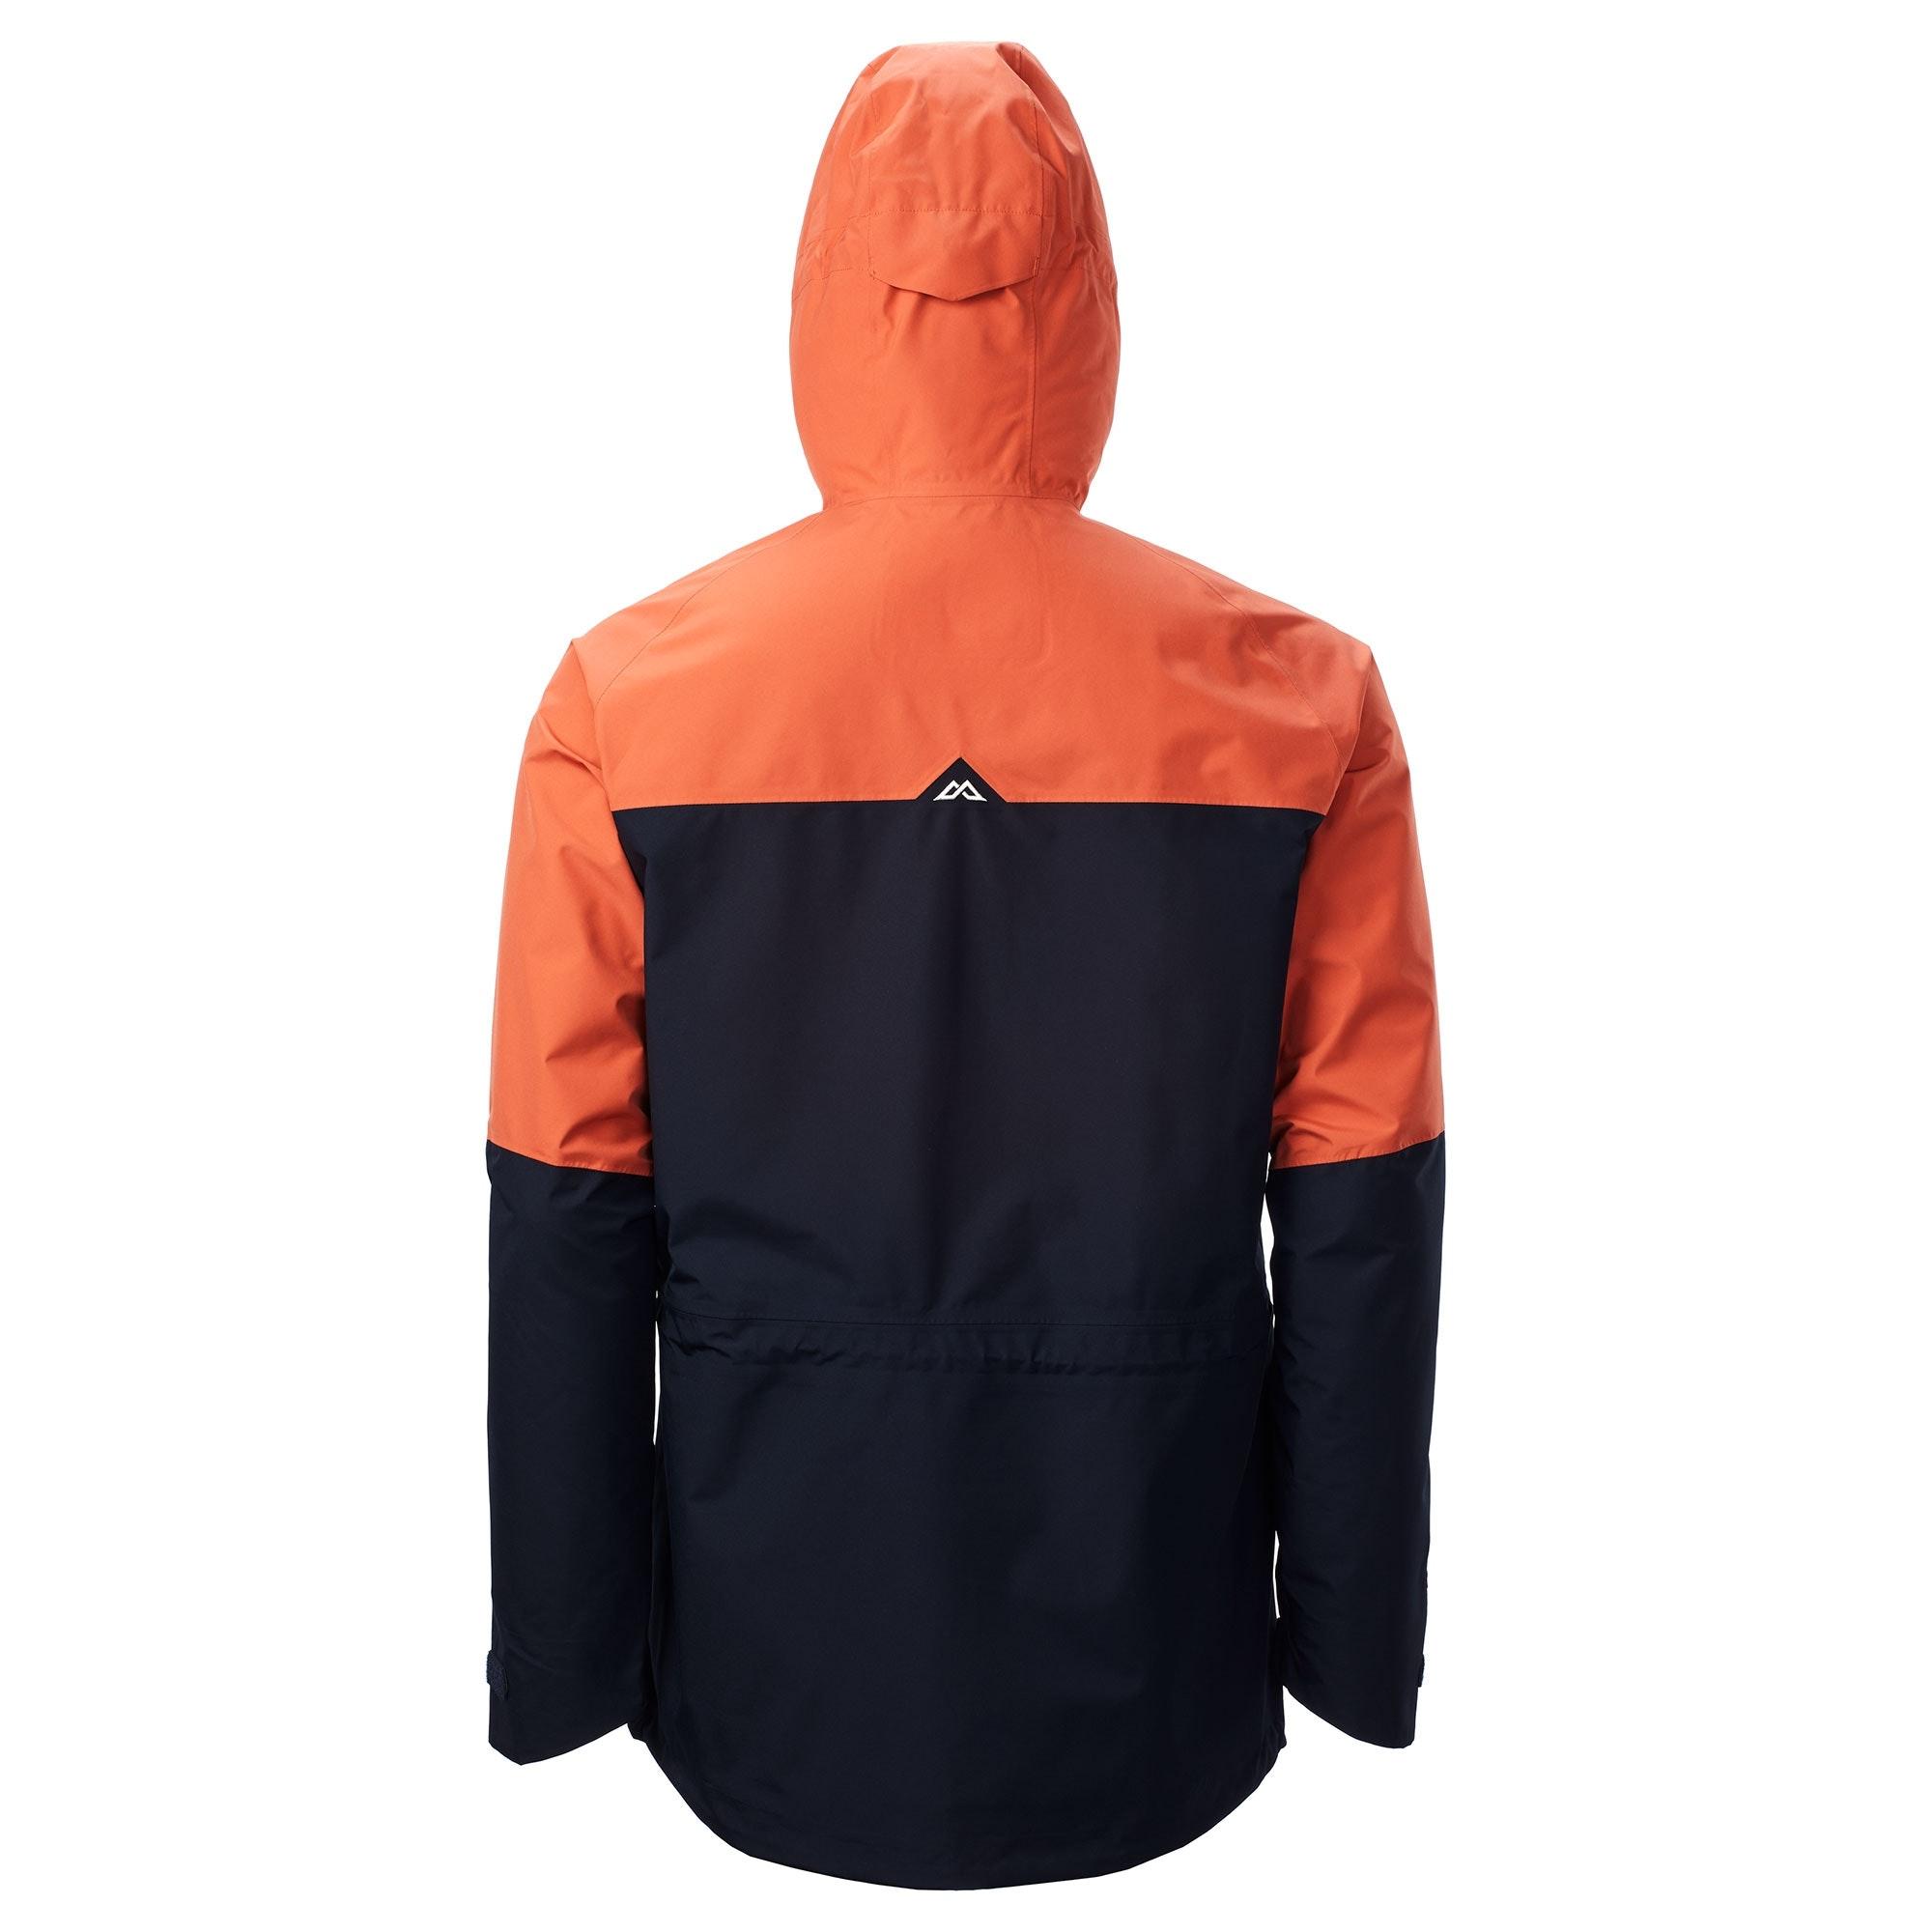 NEW-Kathmandu-Aysen-Men-039-s-GORE-TEX-Windproof-Waterproof-Outdoor-Rain-Jacket thumbnail 11